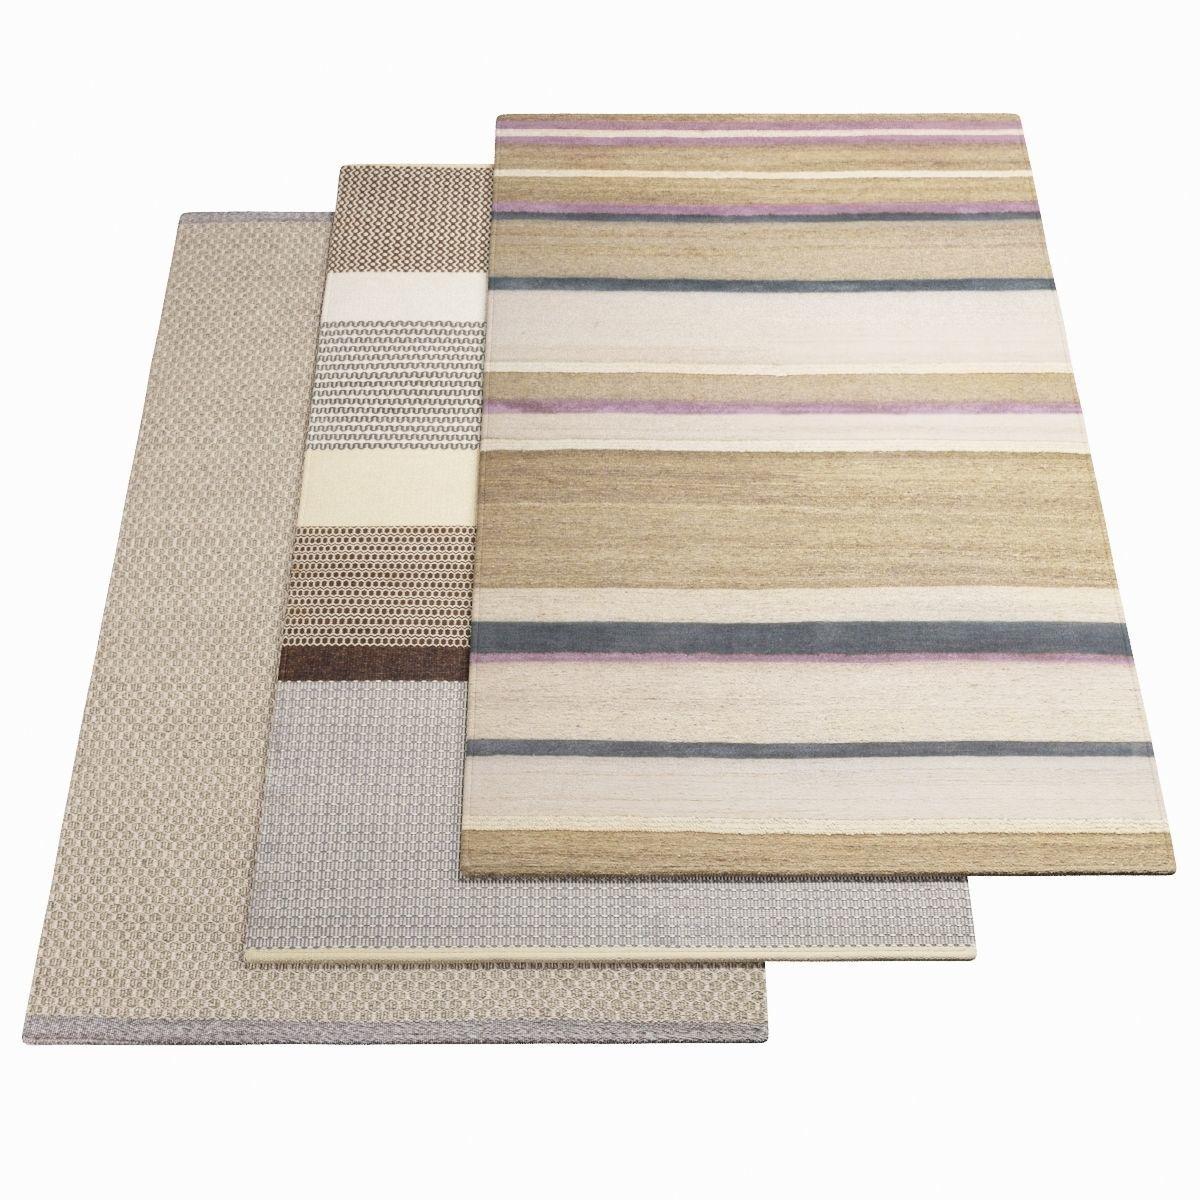 WARLI Carpet for variations 35